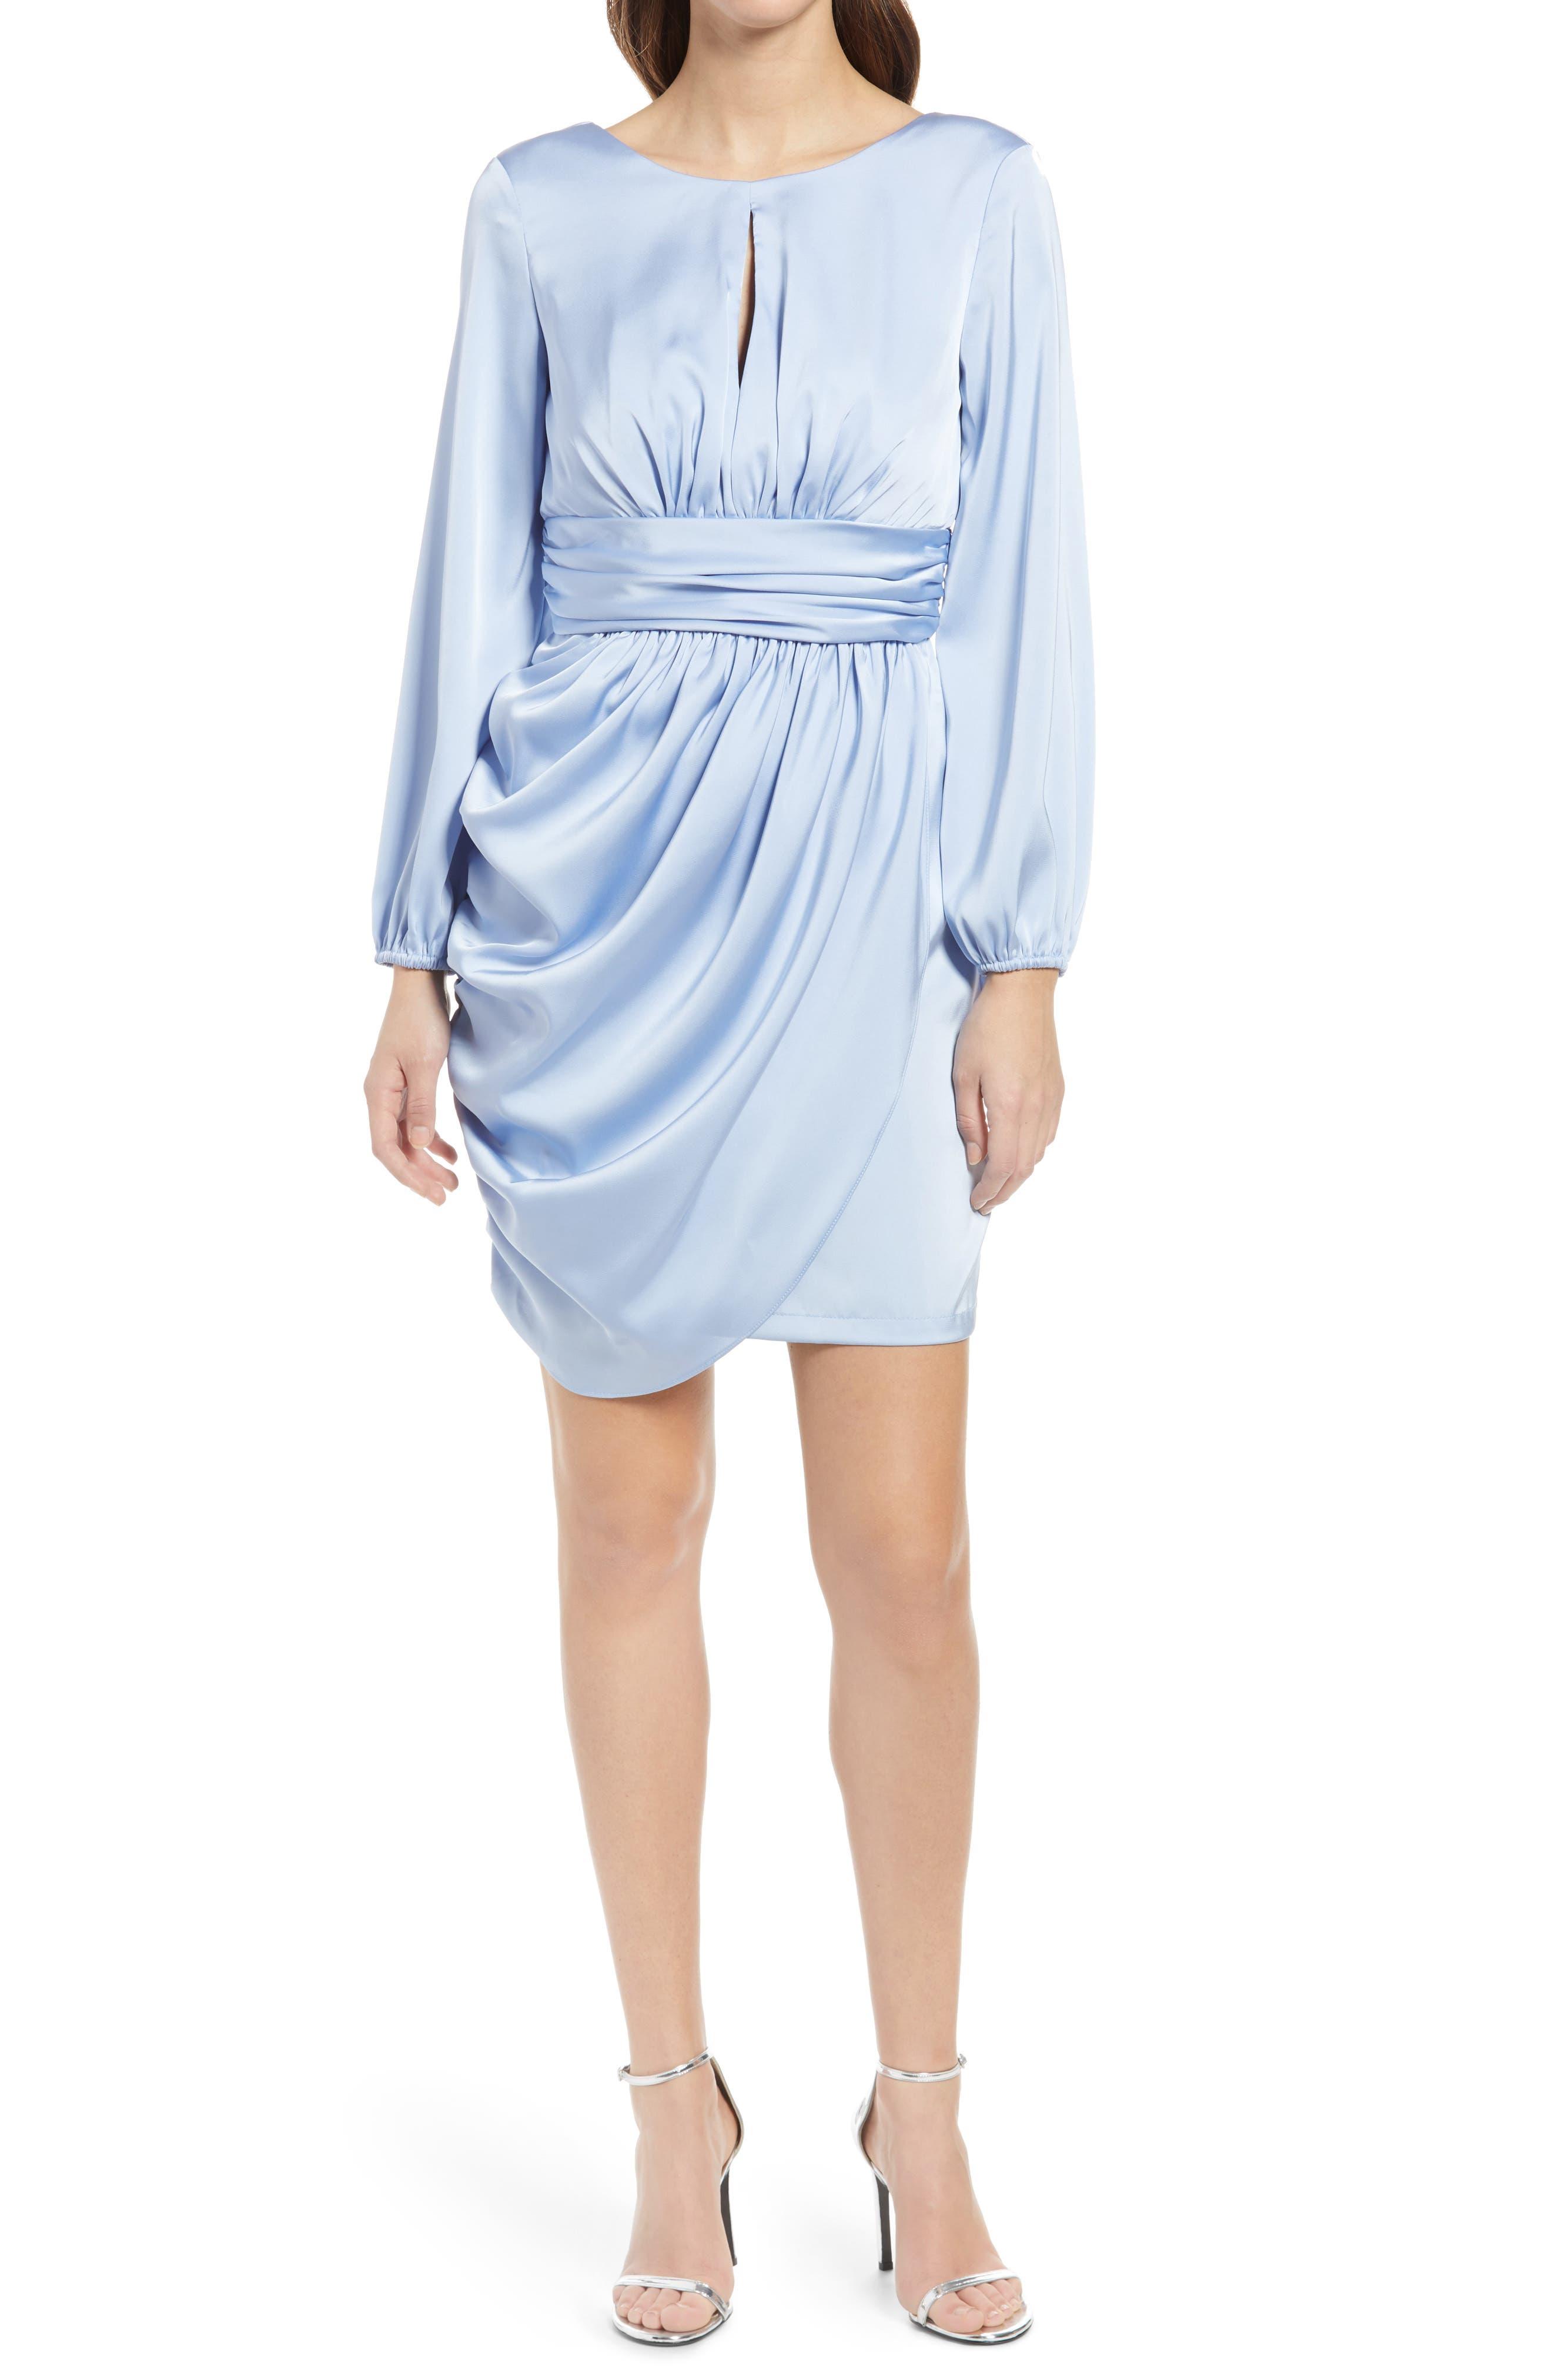 80s Dresses | Casual to Party Dresses Womens Chi Chi London Eva Long Sleeve Minidress Size 8 - Blue $120.00 AT vintagedancer.com